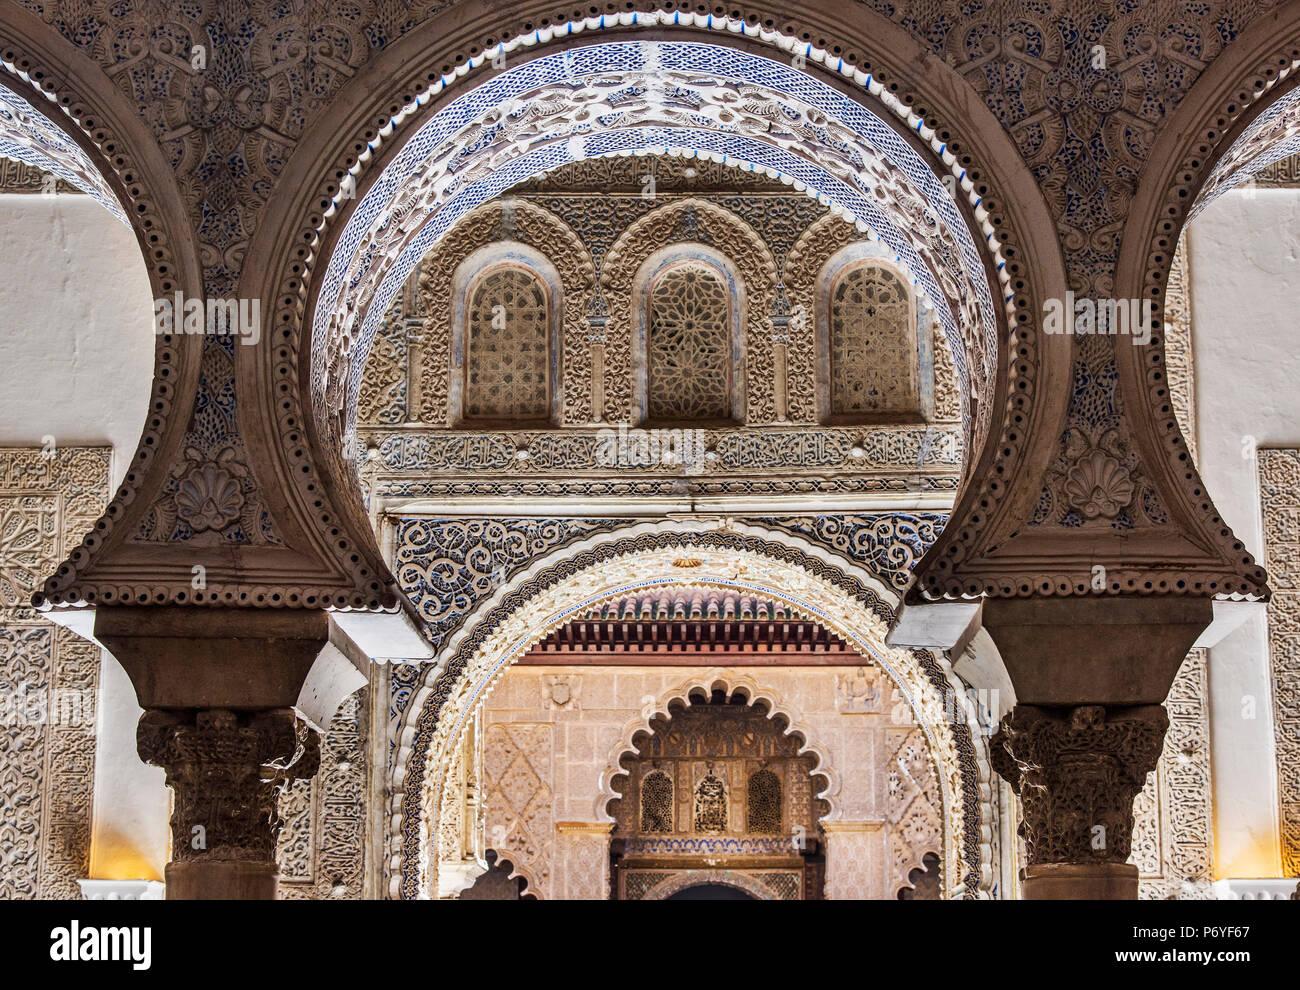 Moorish architecture inside the Alcazar, Seville, Andalusia, Spain Stock Photo